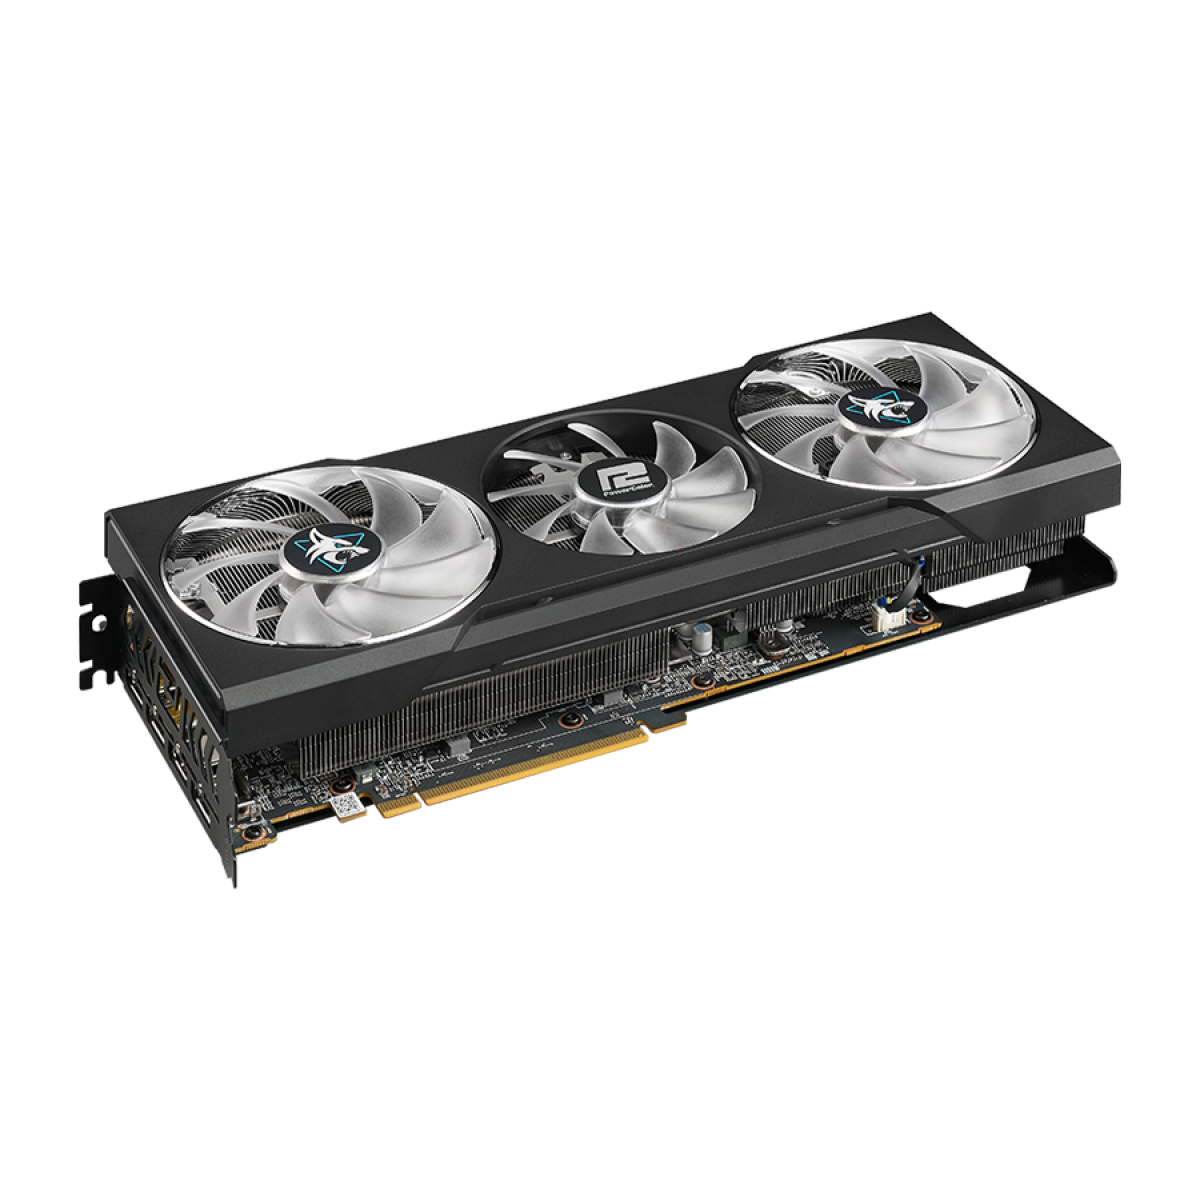 Placa de Vídeo PowerColor Hellhound Radeon RX 6700 XT, 12GB, GDDR6, 192bit, AXRX 6700XT 12GBD6-3DHL